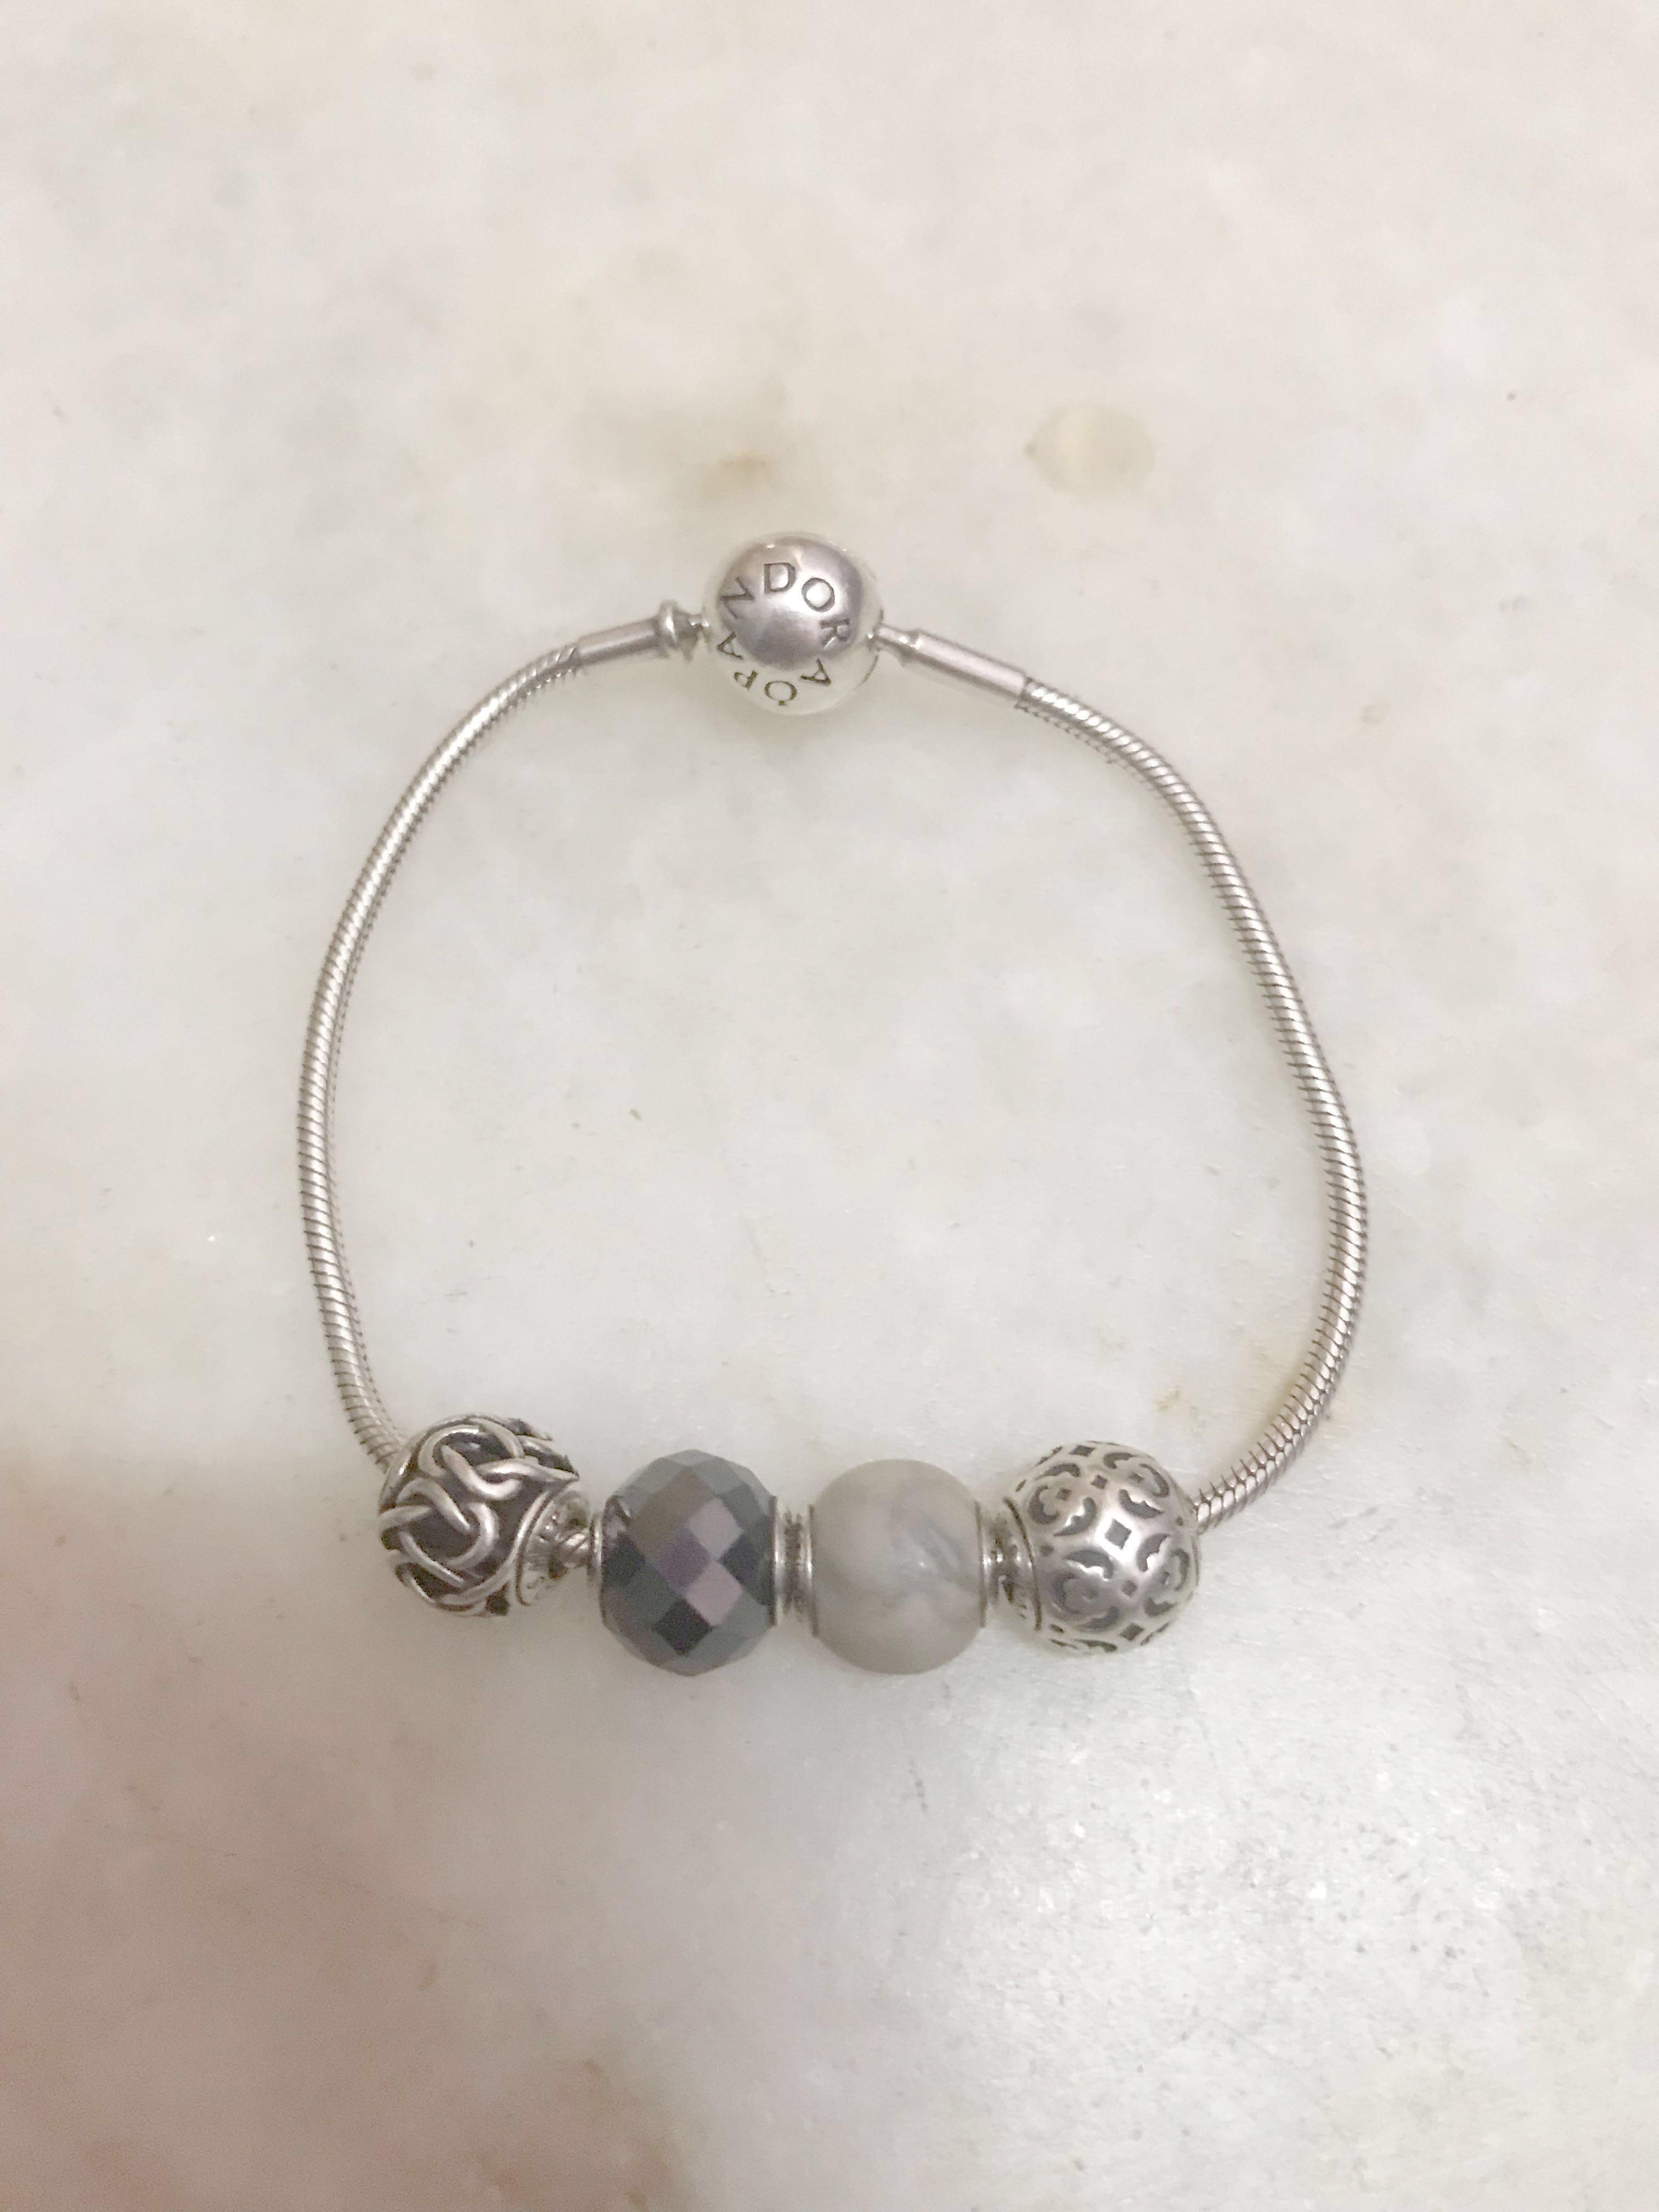 a58d08f5d Pandora Essence Bracelet 16cm charms sold seperately, Women's ...